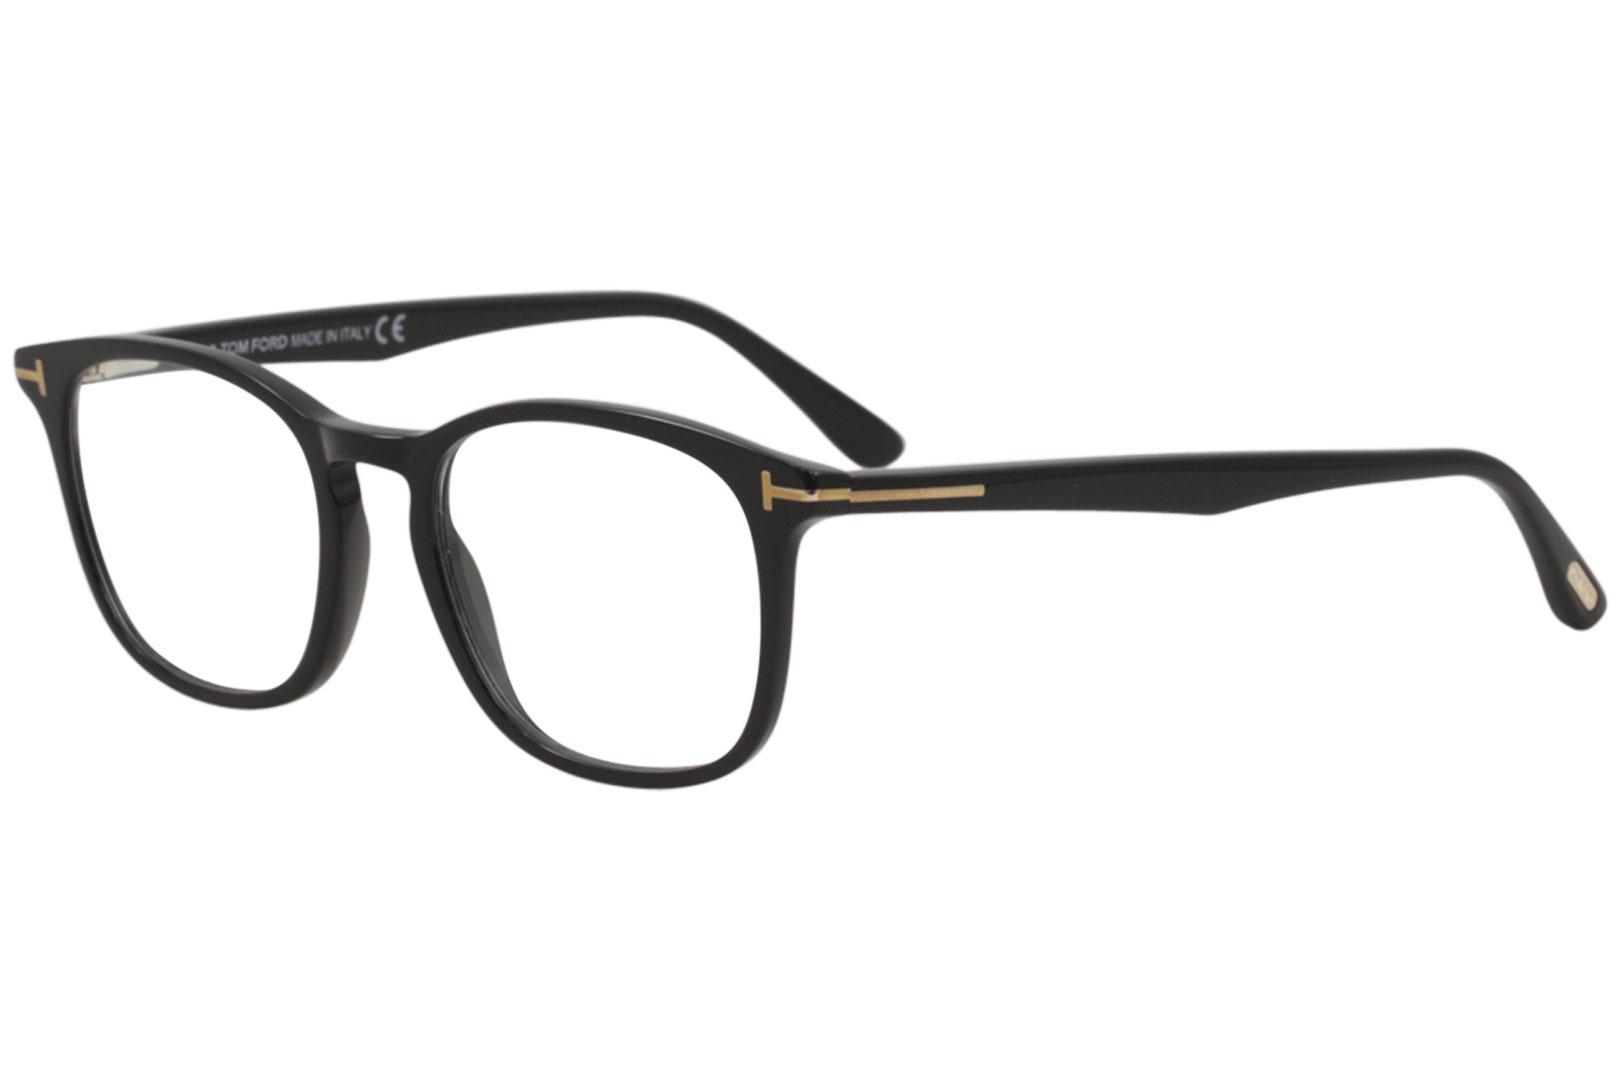 774e074349bf Details about Tom Ford Men s Eyeglasses TF5505 TF 5505 001 Shiny Black Optical  Frame 52mm